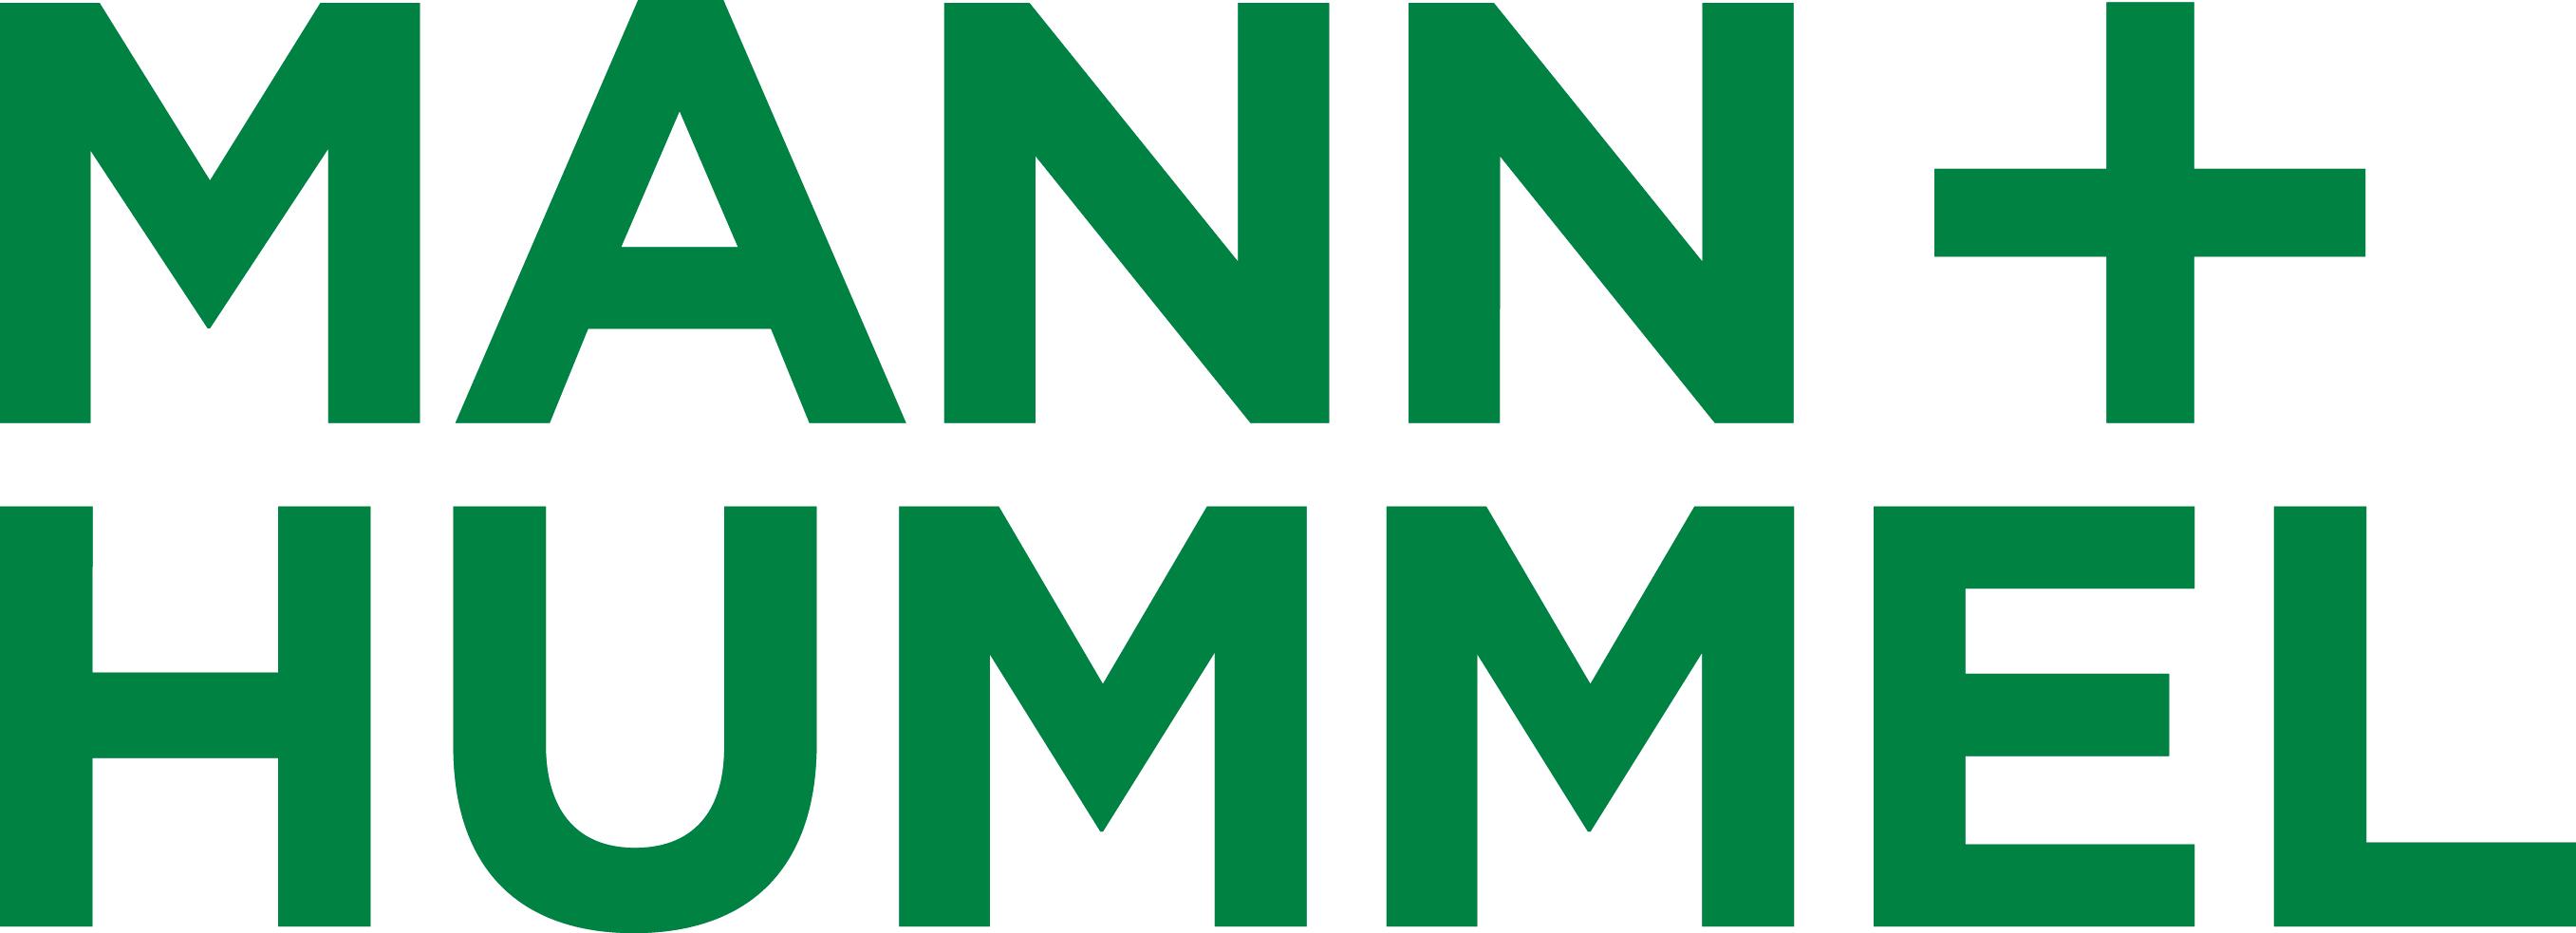 Filmproduktion Smartfilmmedia - Mann + Hummel Logo